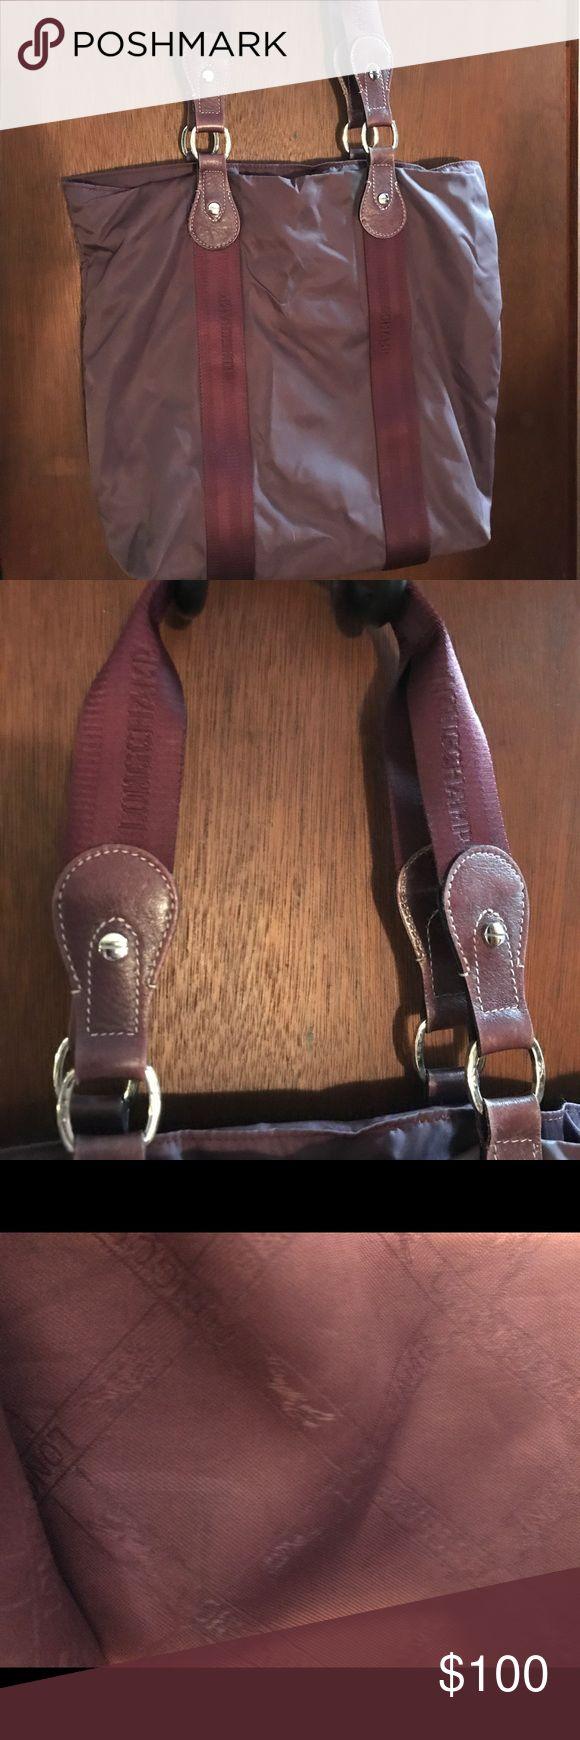 Longchamp Women's Tote Beautiful Burgundy Longchamp Women's Tote. Small Marks of Wear. Perfect Christmas Present! Longchamp Bags Totes